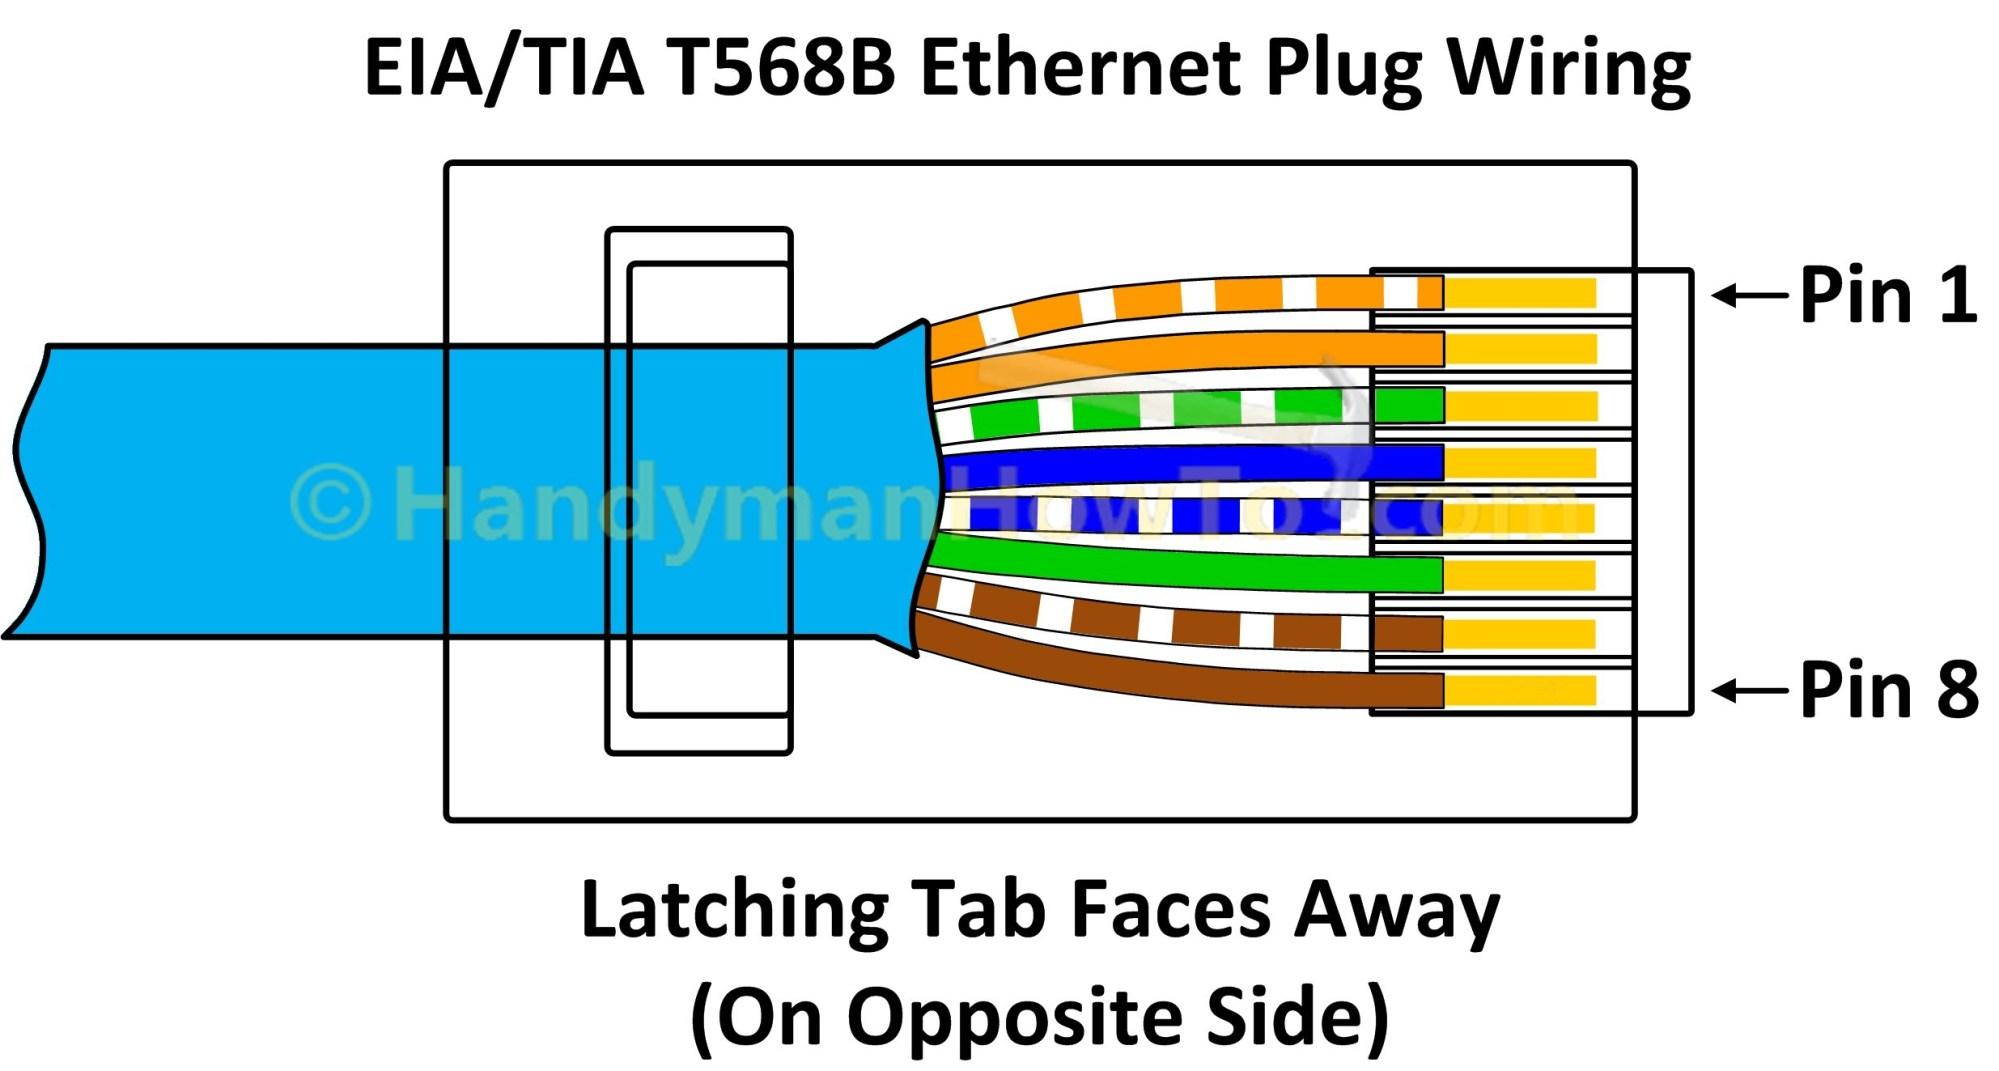 hight resolution of standard cat 5 wiring diagram wiring library cat 5 crossover diagram standard cat 5 wiring diagram